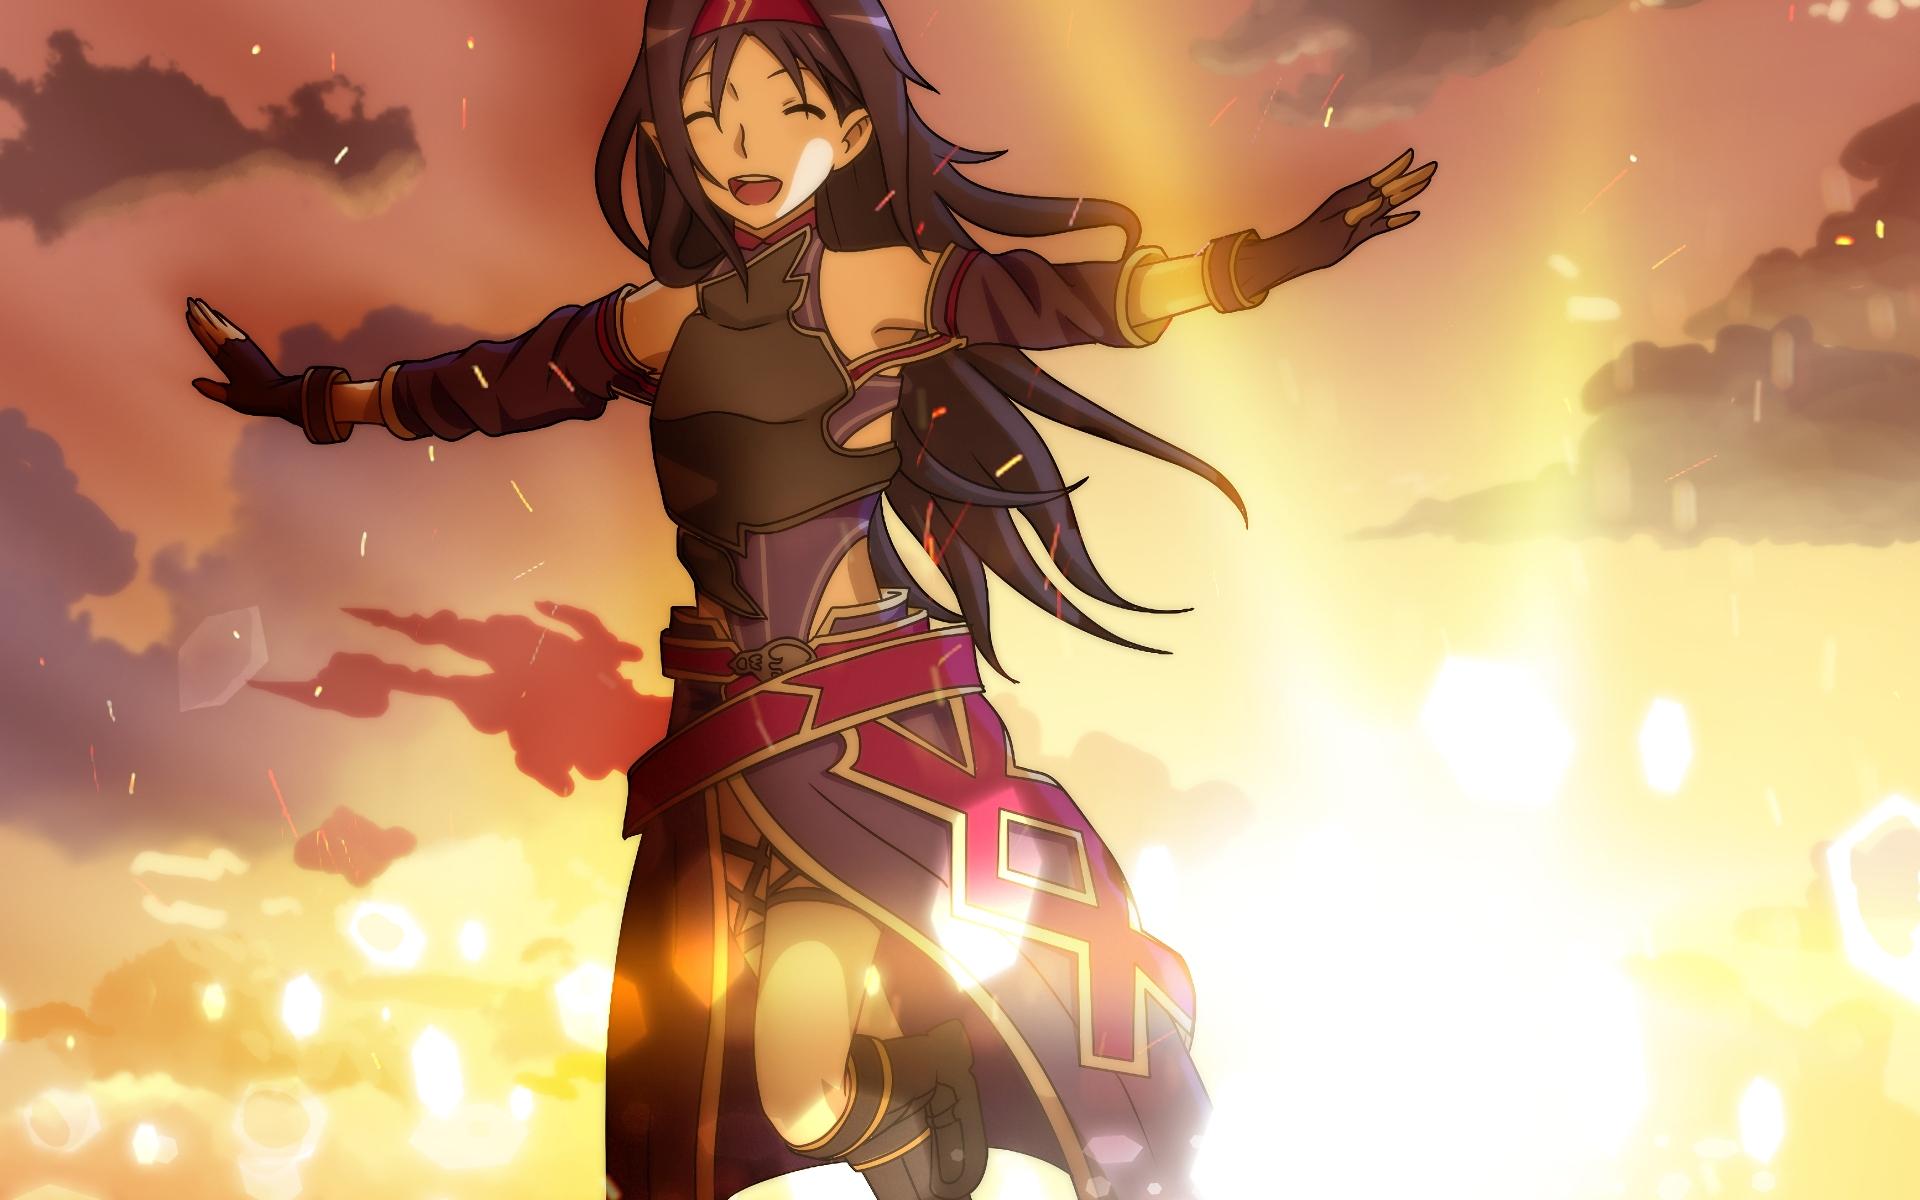 long hair, purple hair, blue eyes, anime, anime girls